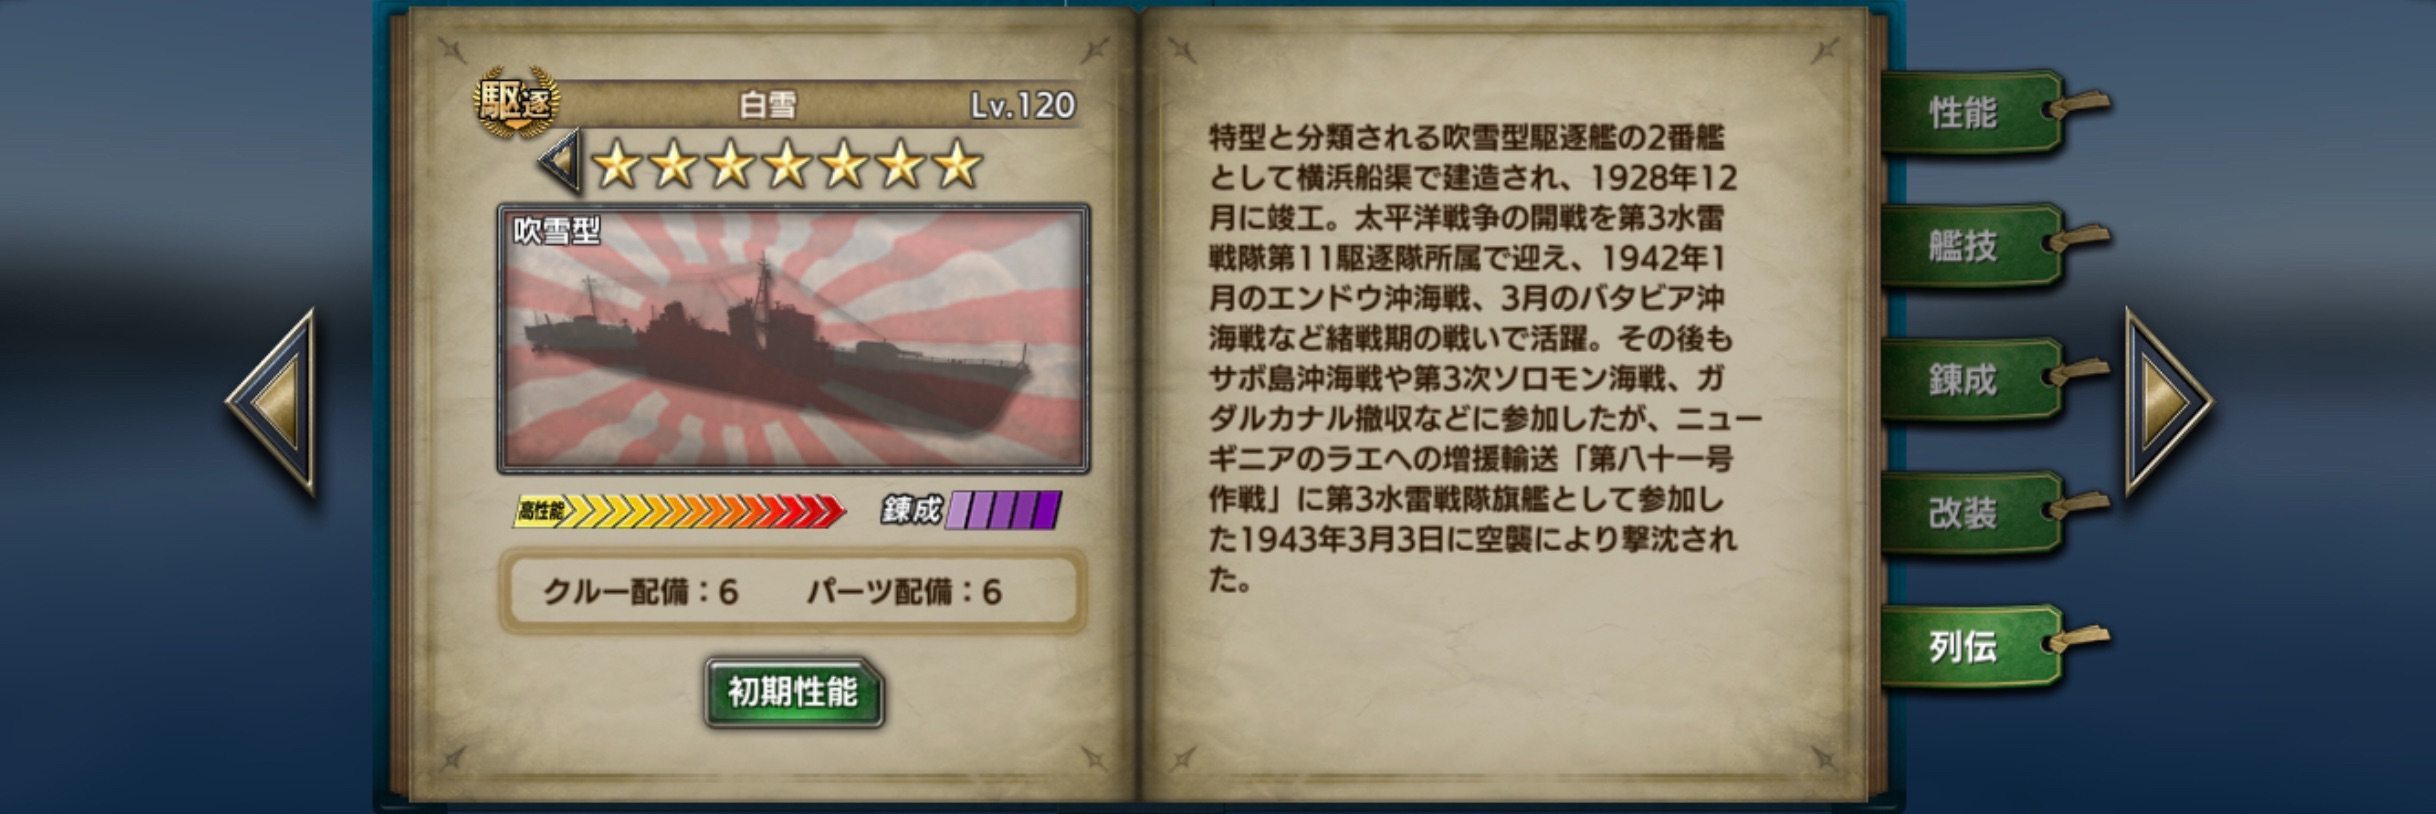 shirayuki-history